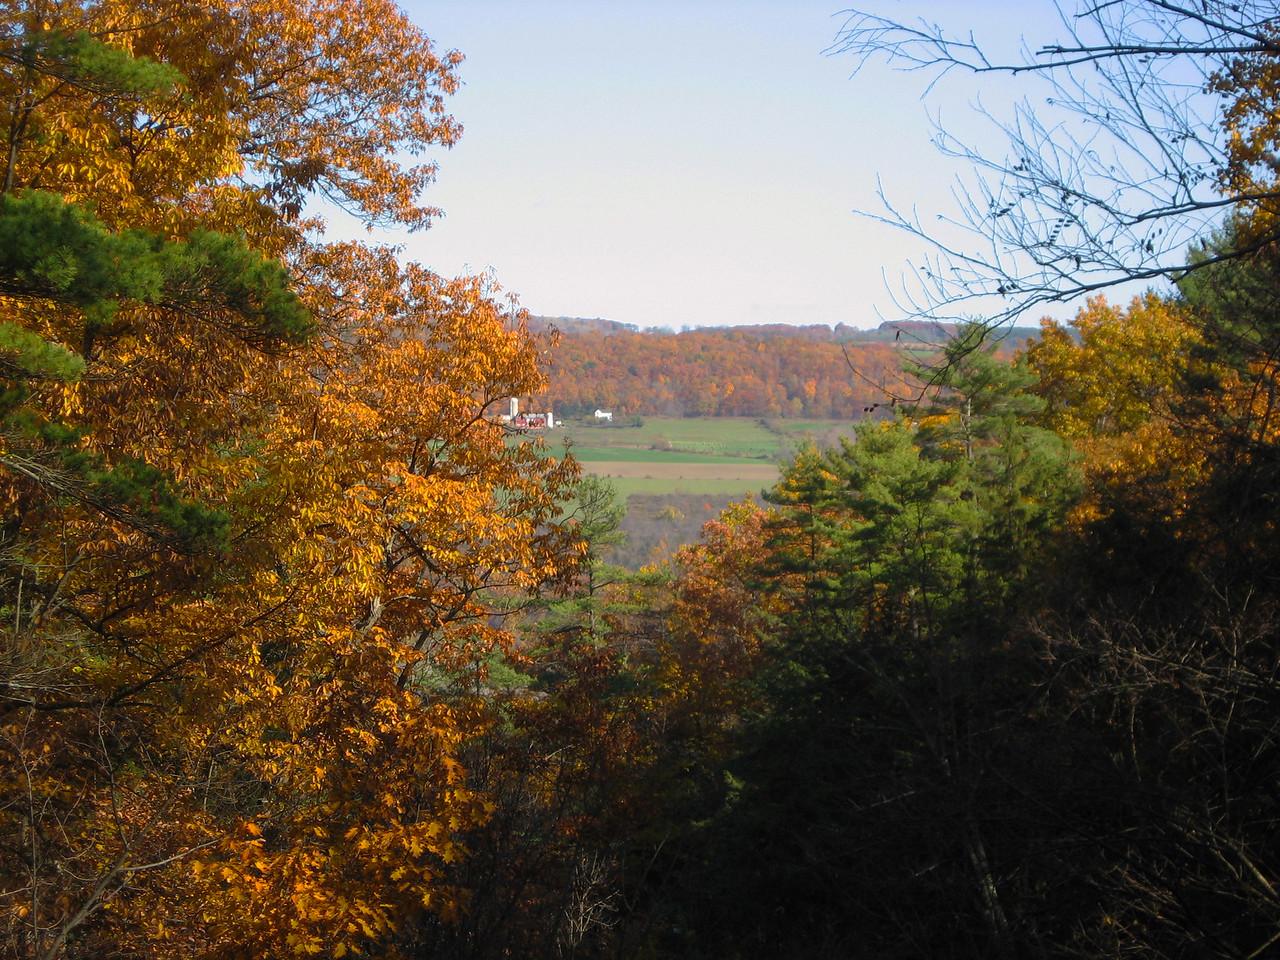 Autumnal Overlook